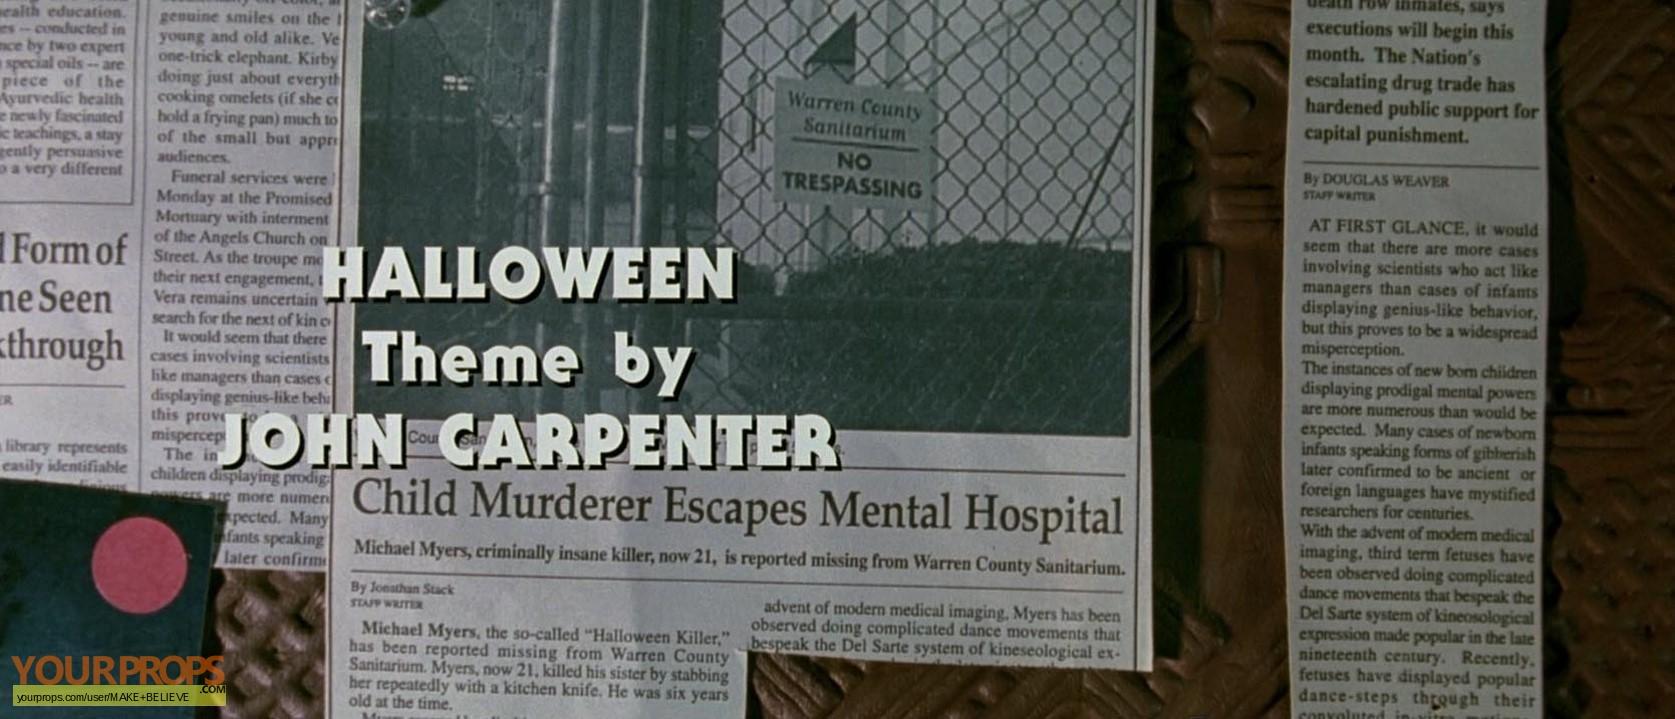 Halloween H20: 20 Years Later Newspaper clip - Child Murderer